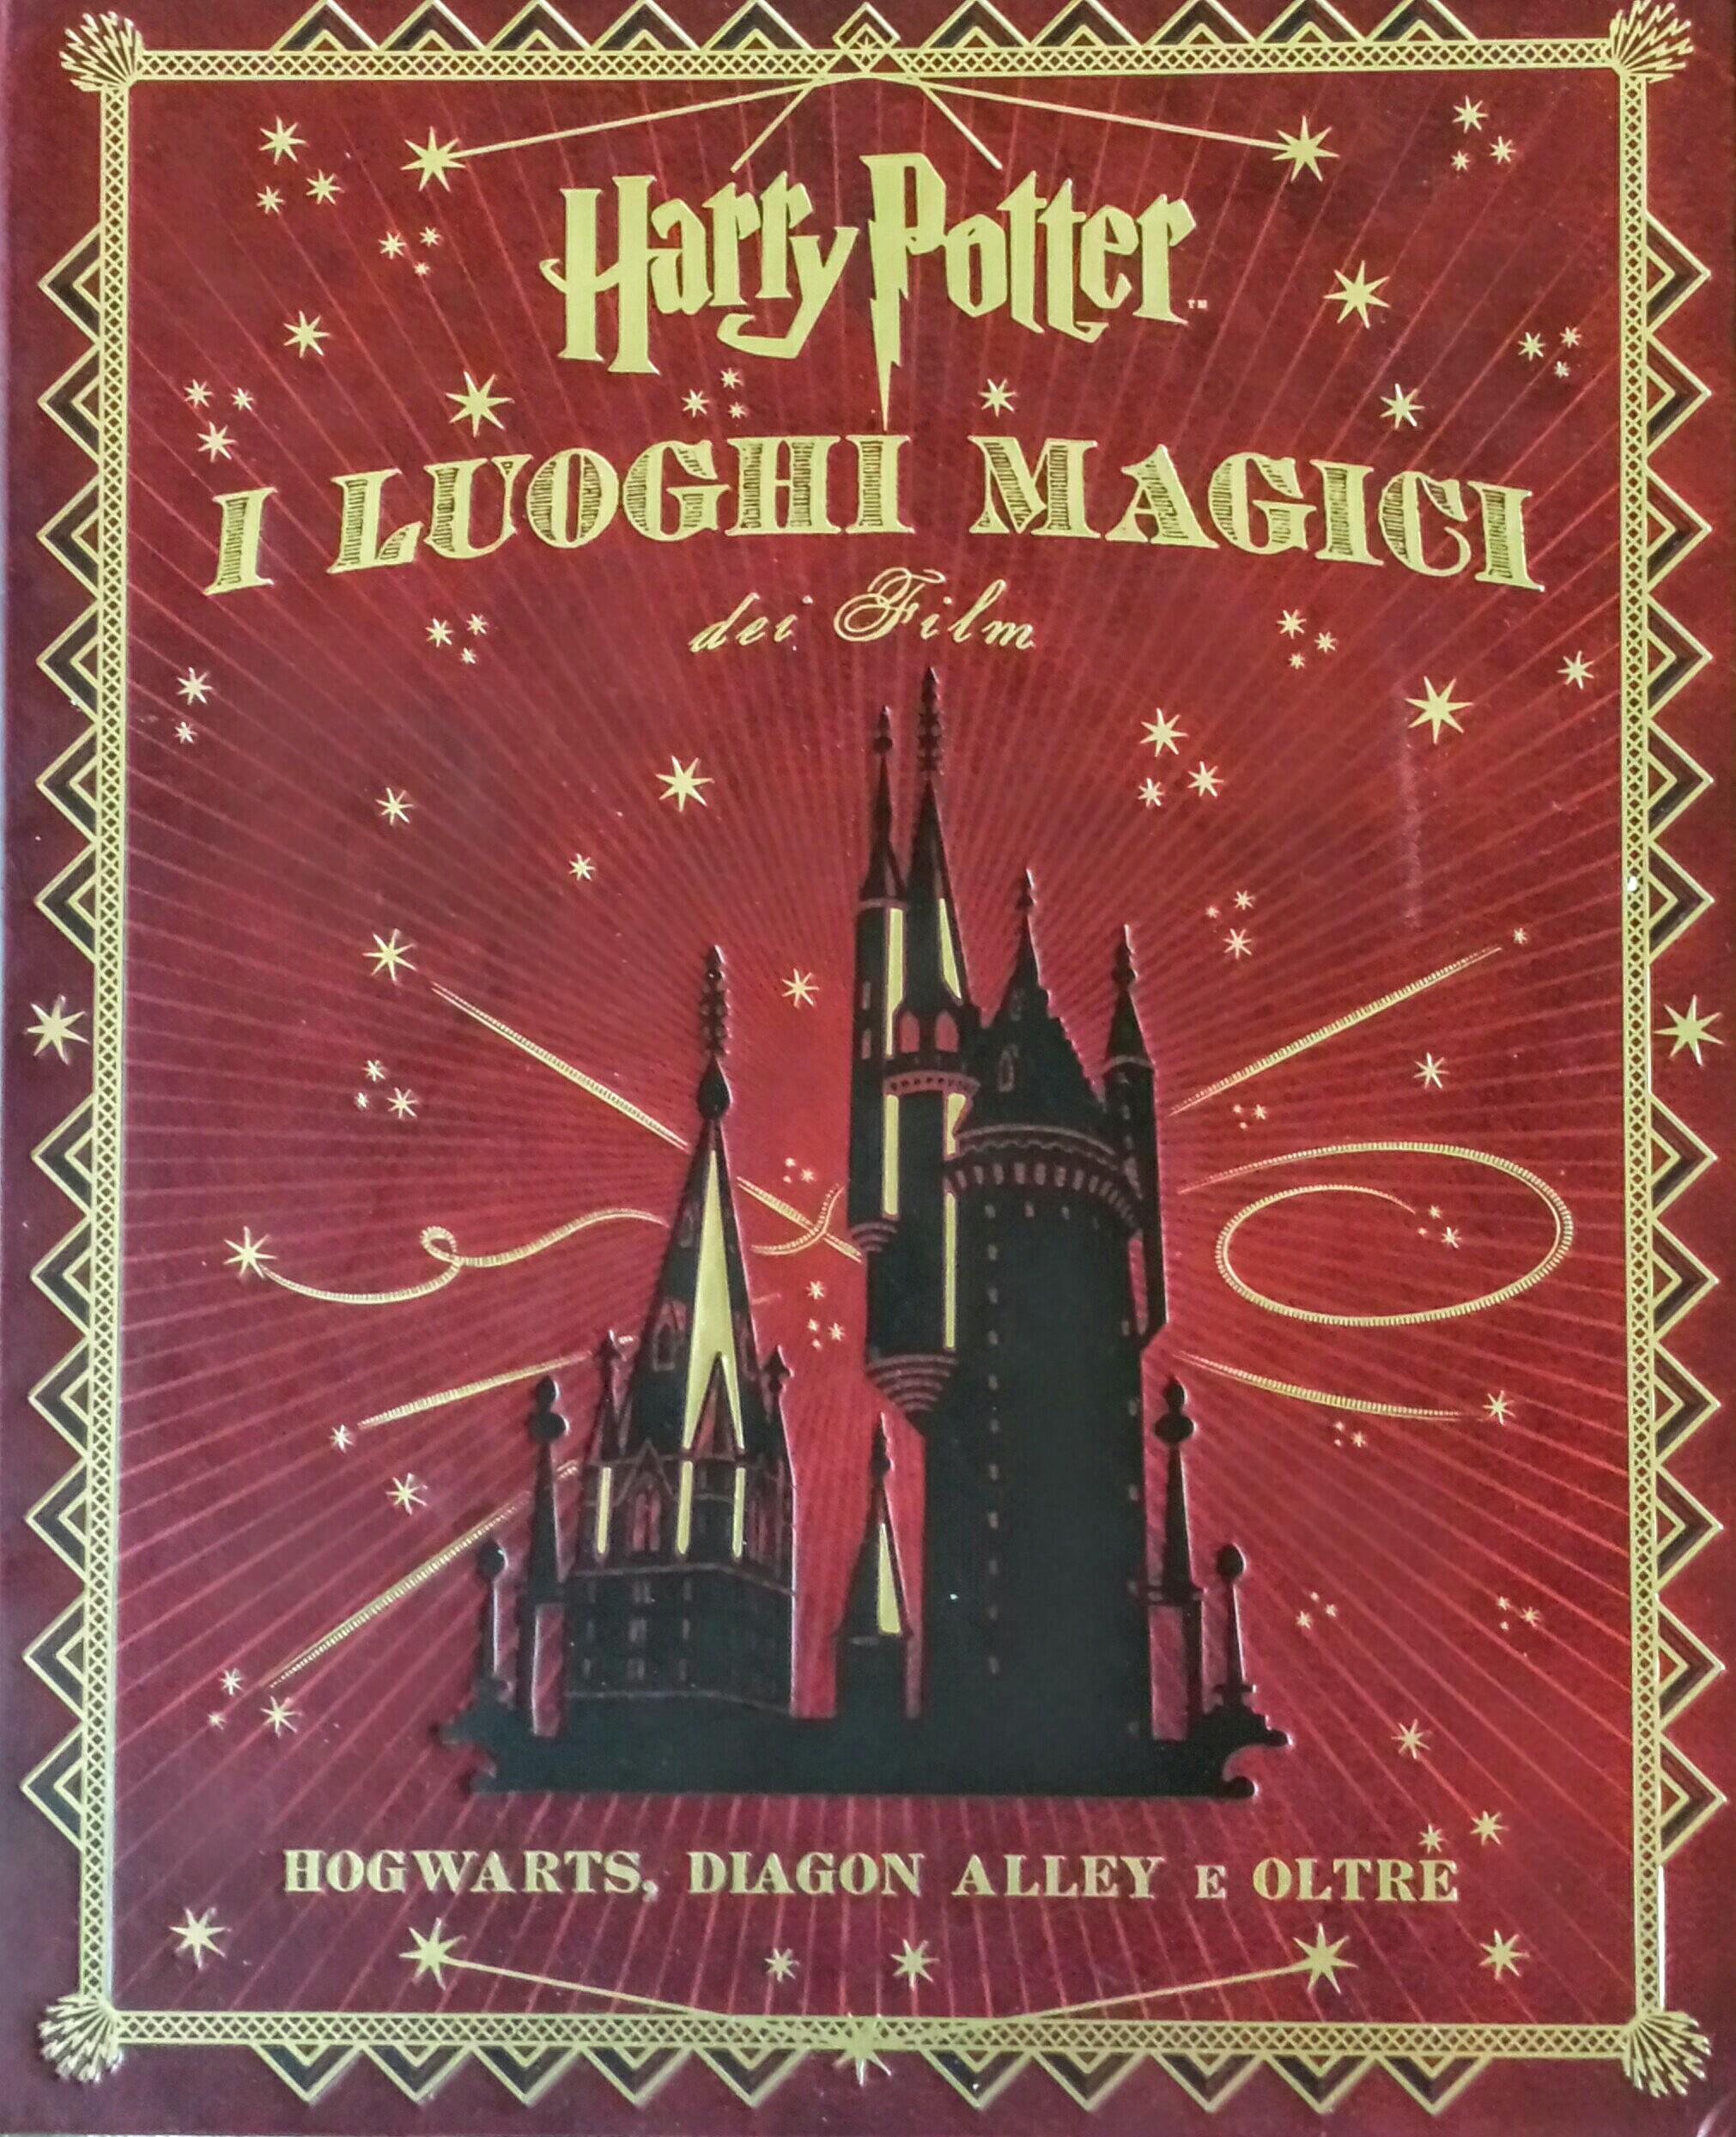 Harry Potter: I luoghi magici dei film